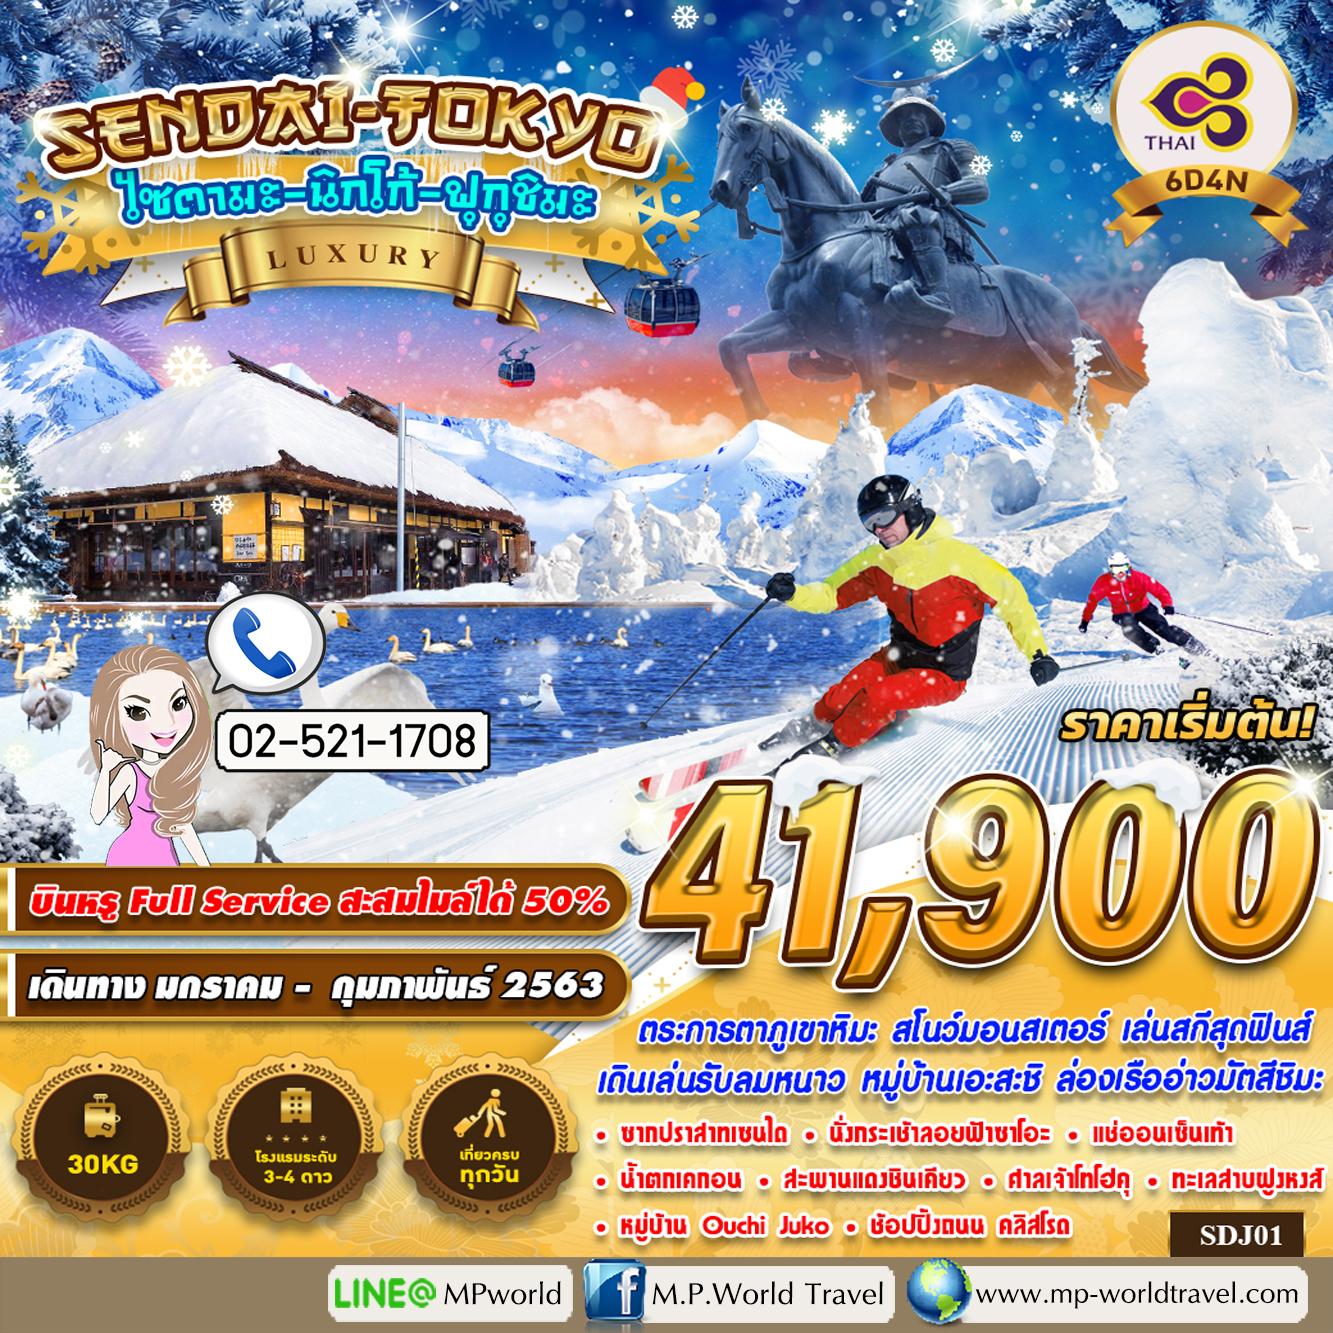 SDJ01 SENDAI TOKYO ไซตามะ- นิกโก้ ฟุกุชิมะ 6D 4N TG